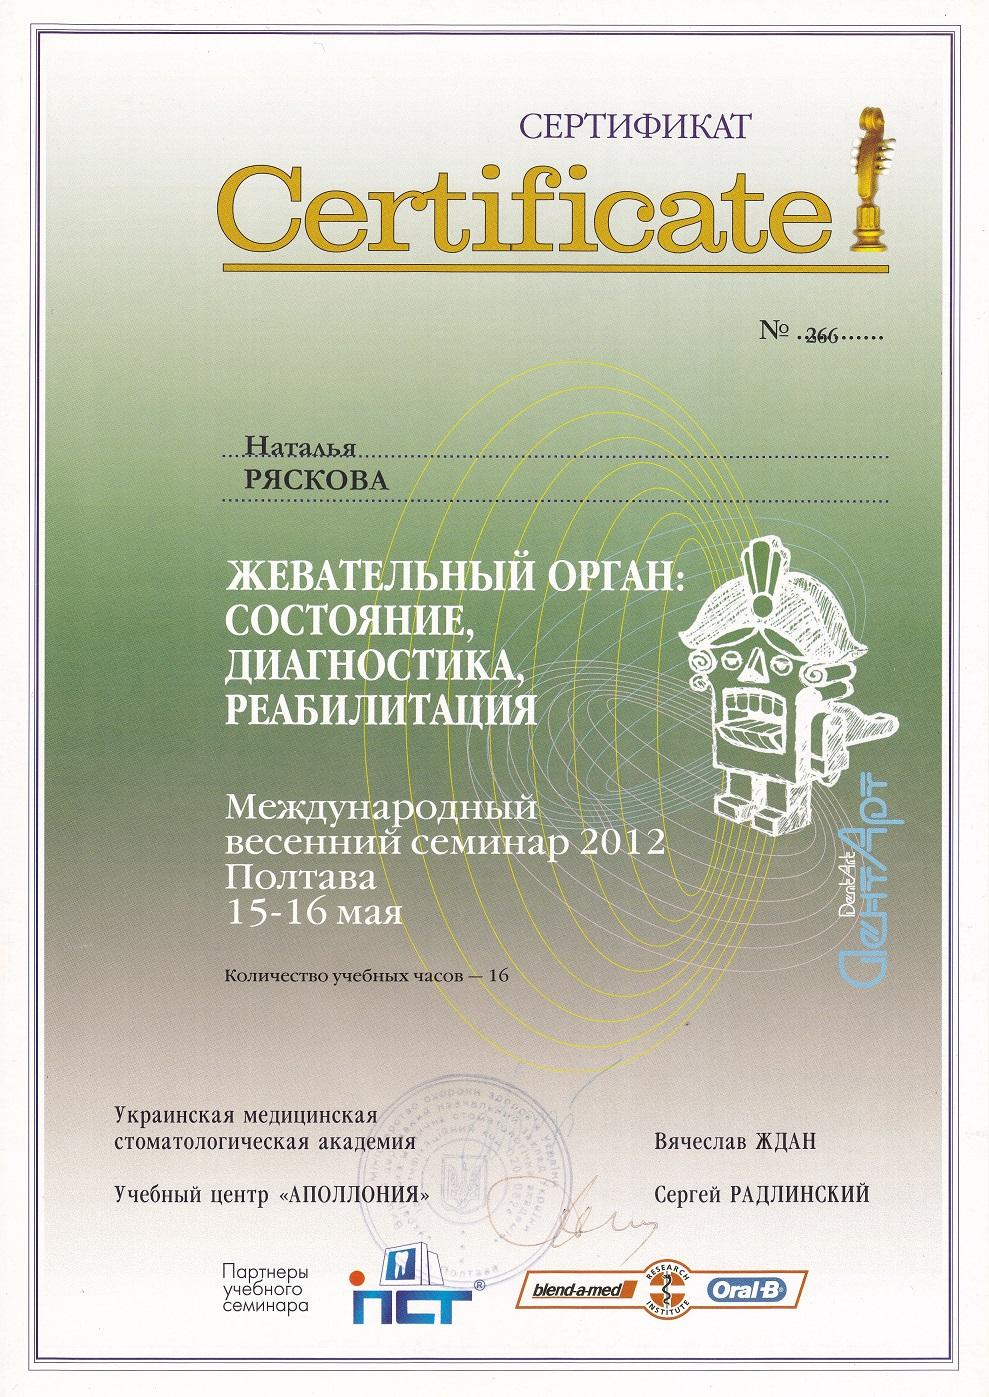 http://oris-vidnoe.ru/wp-content/uploads/2021/05/ryaskova4.jpg